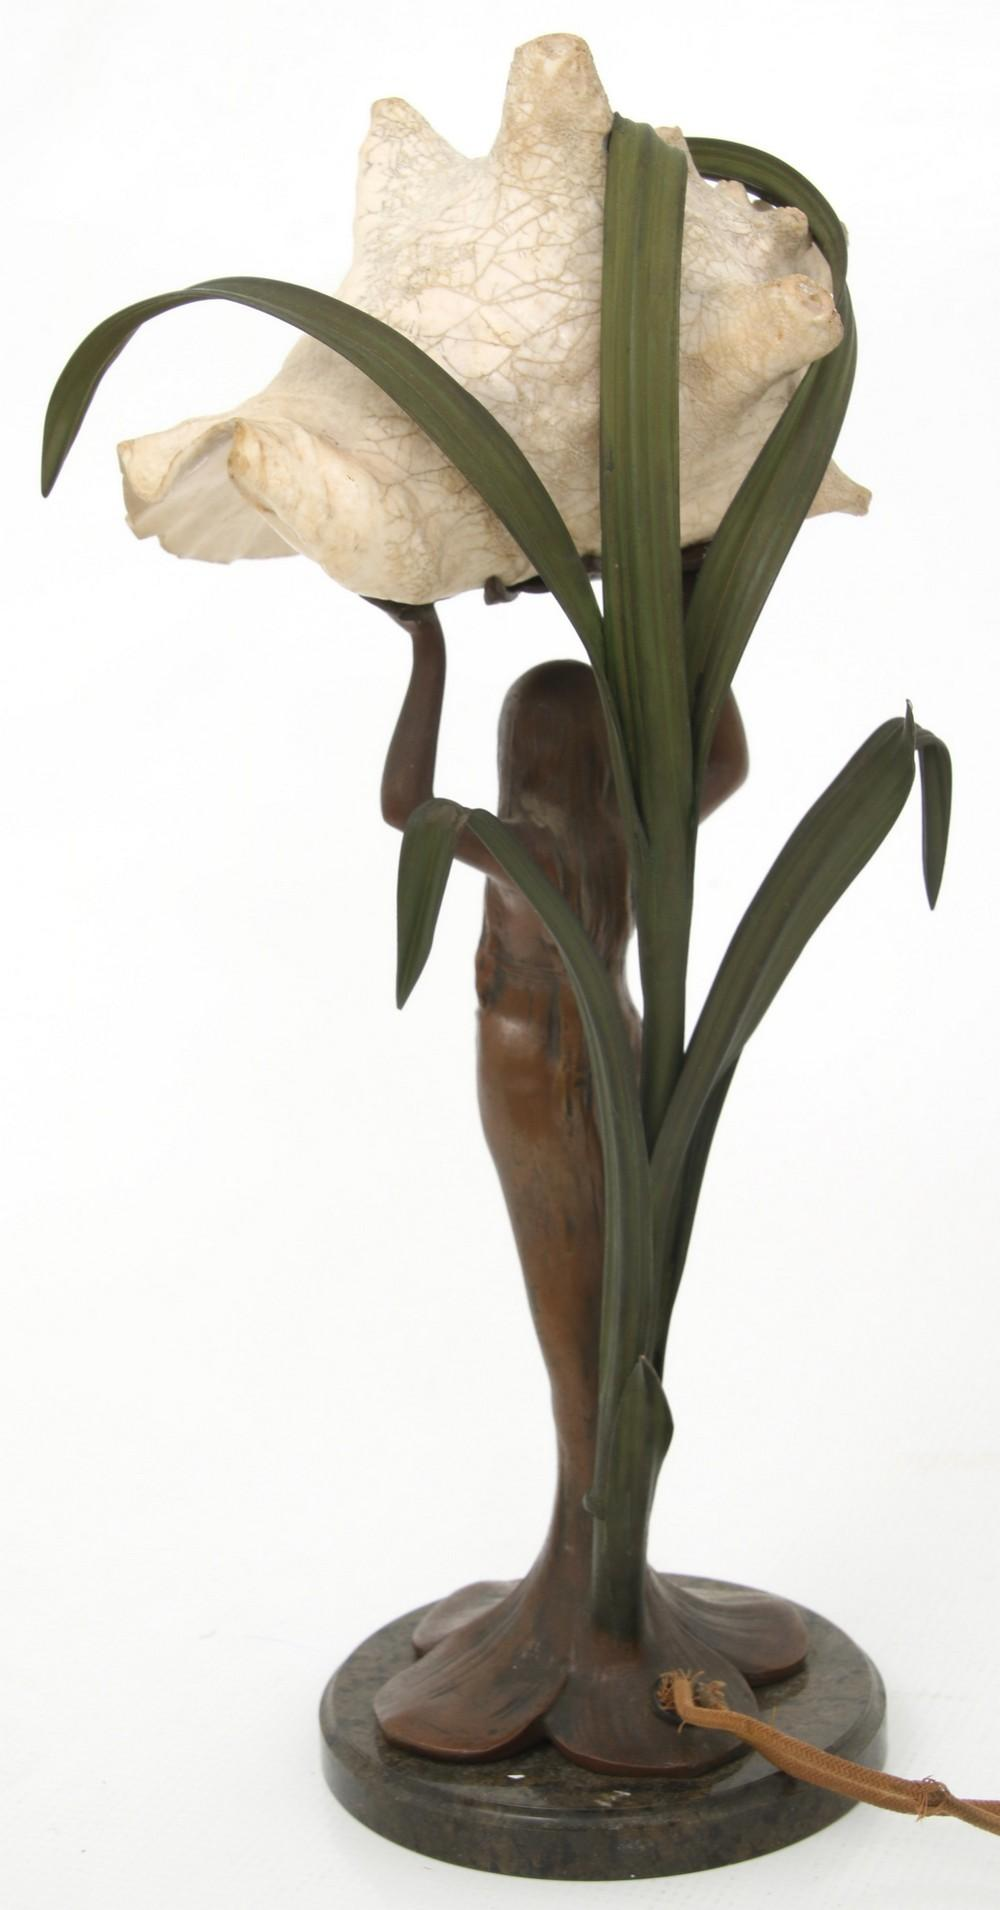 Art Nouveau Lamp with Shell